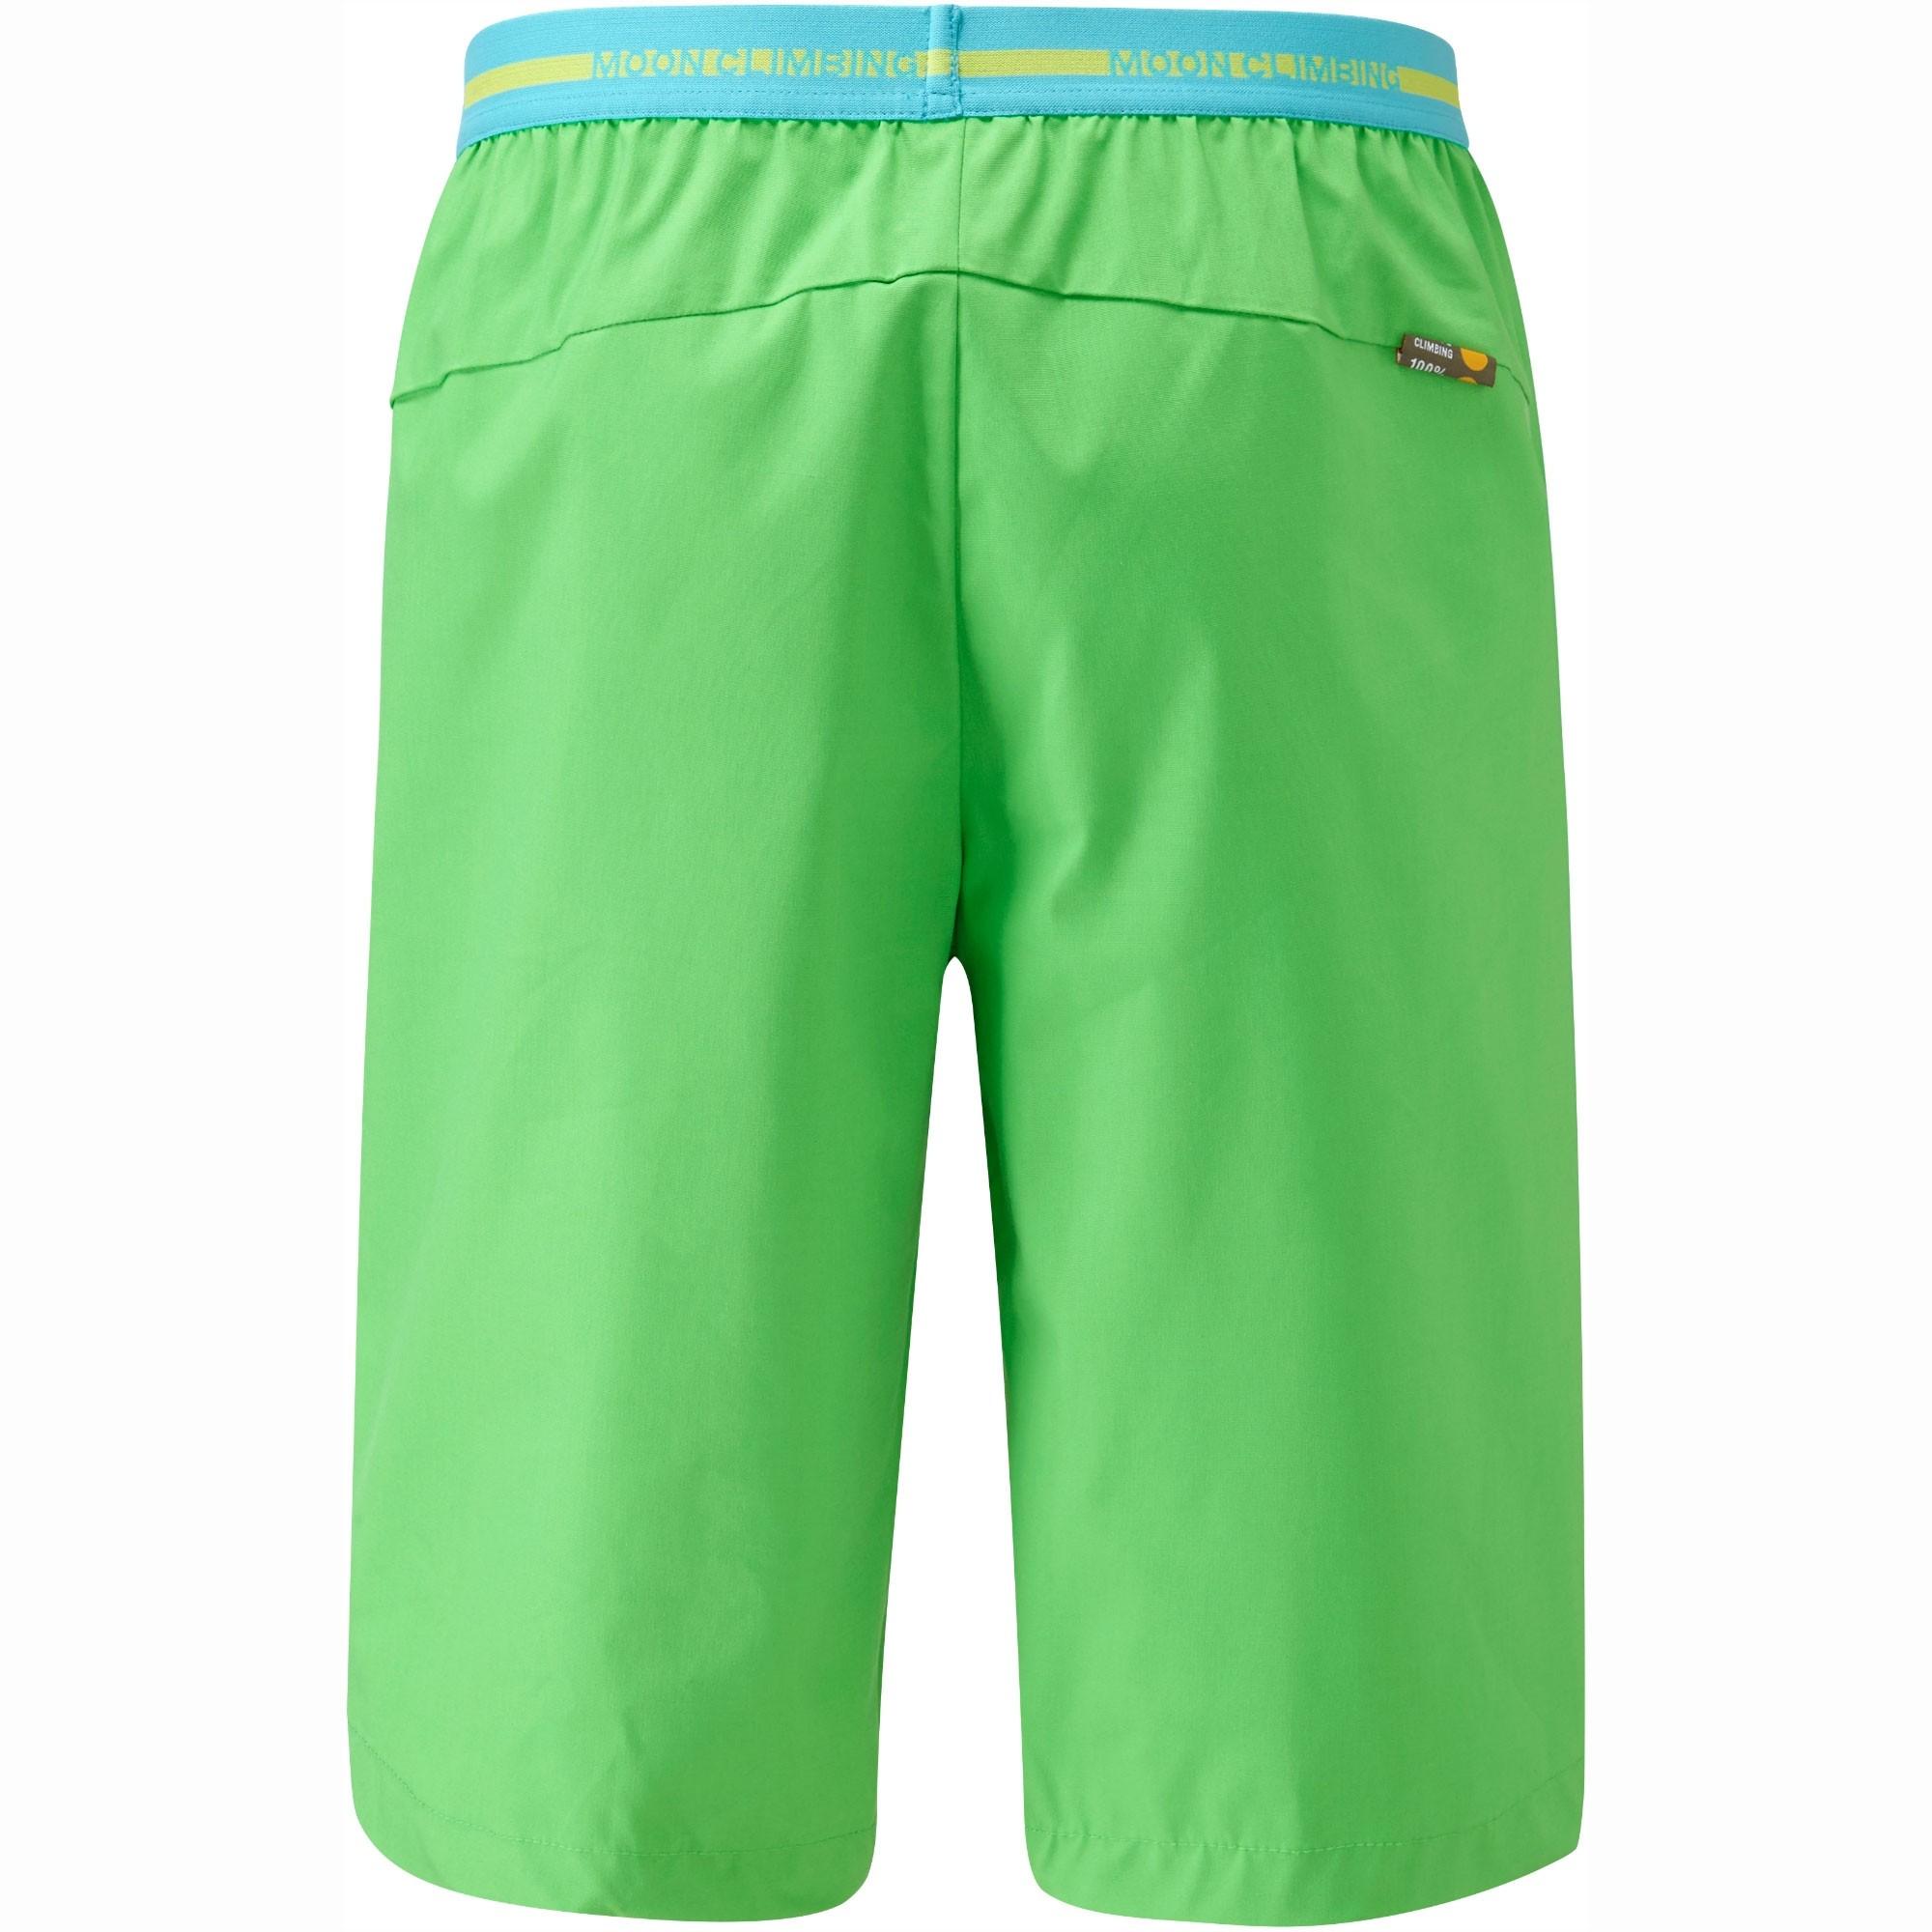 Moon Samurai Climbing Shorts - Classic Green